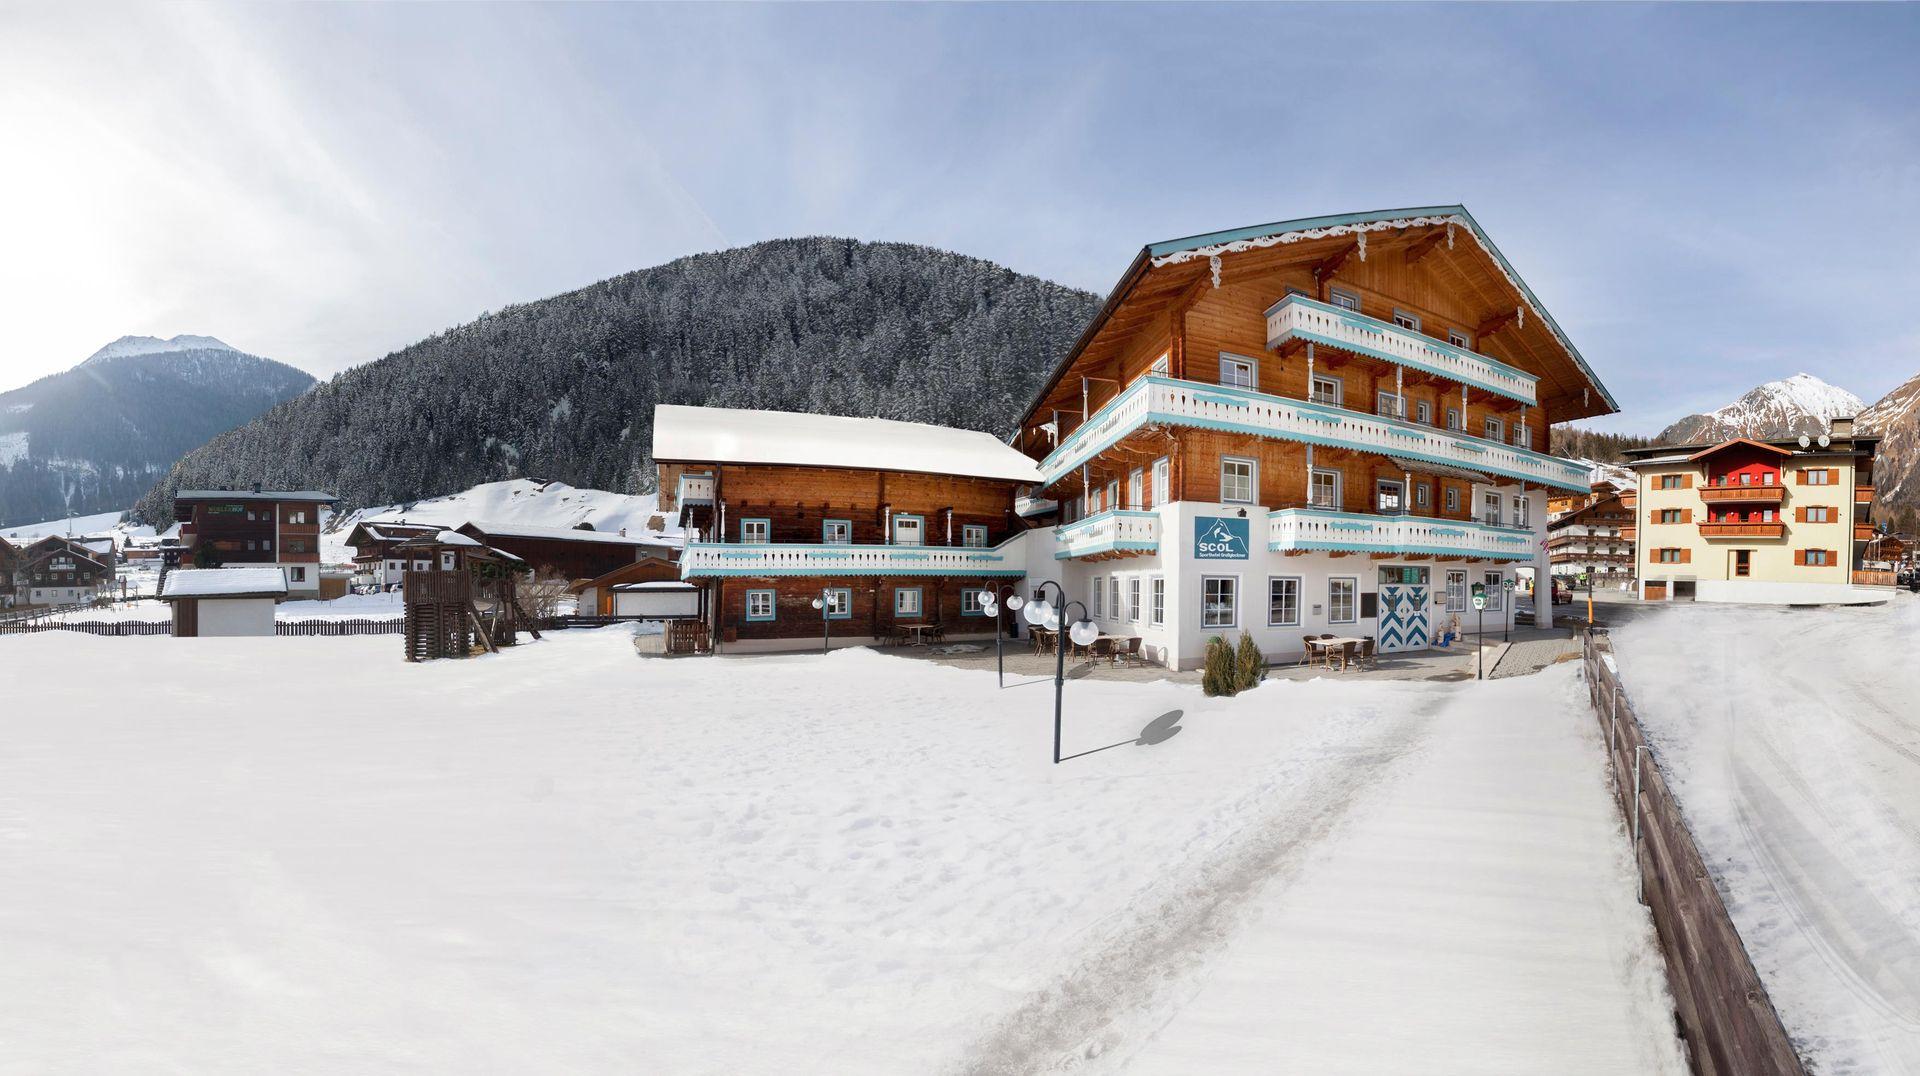 SCOL Sporthotel Großglockner